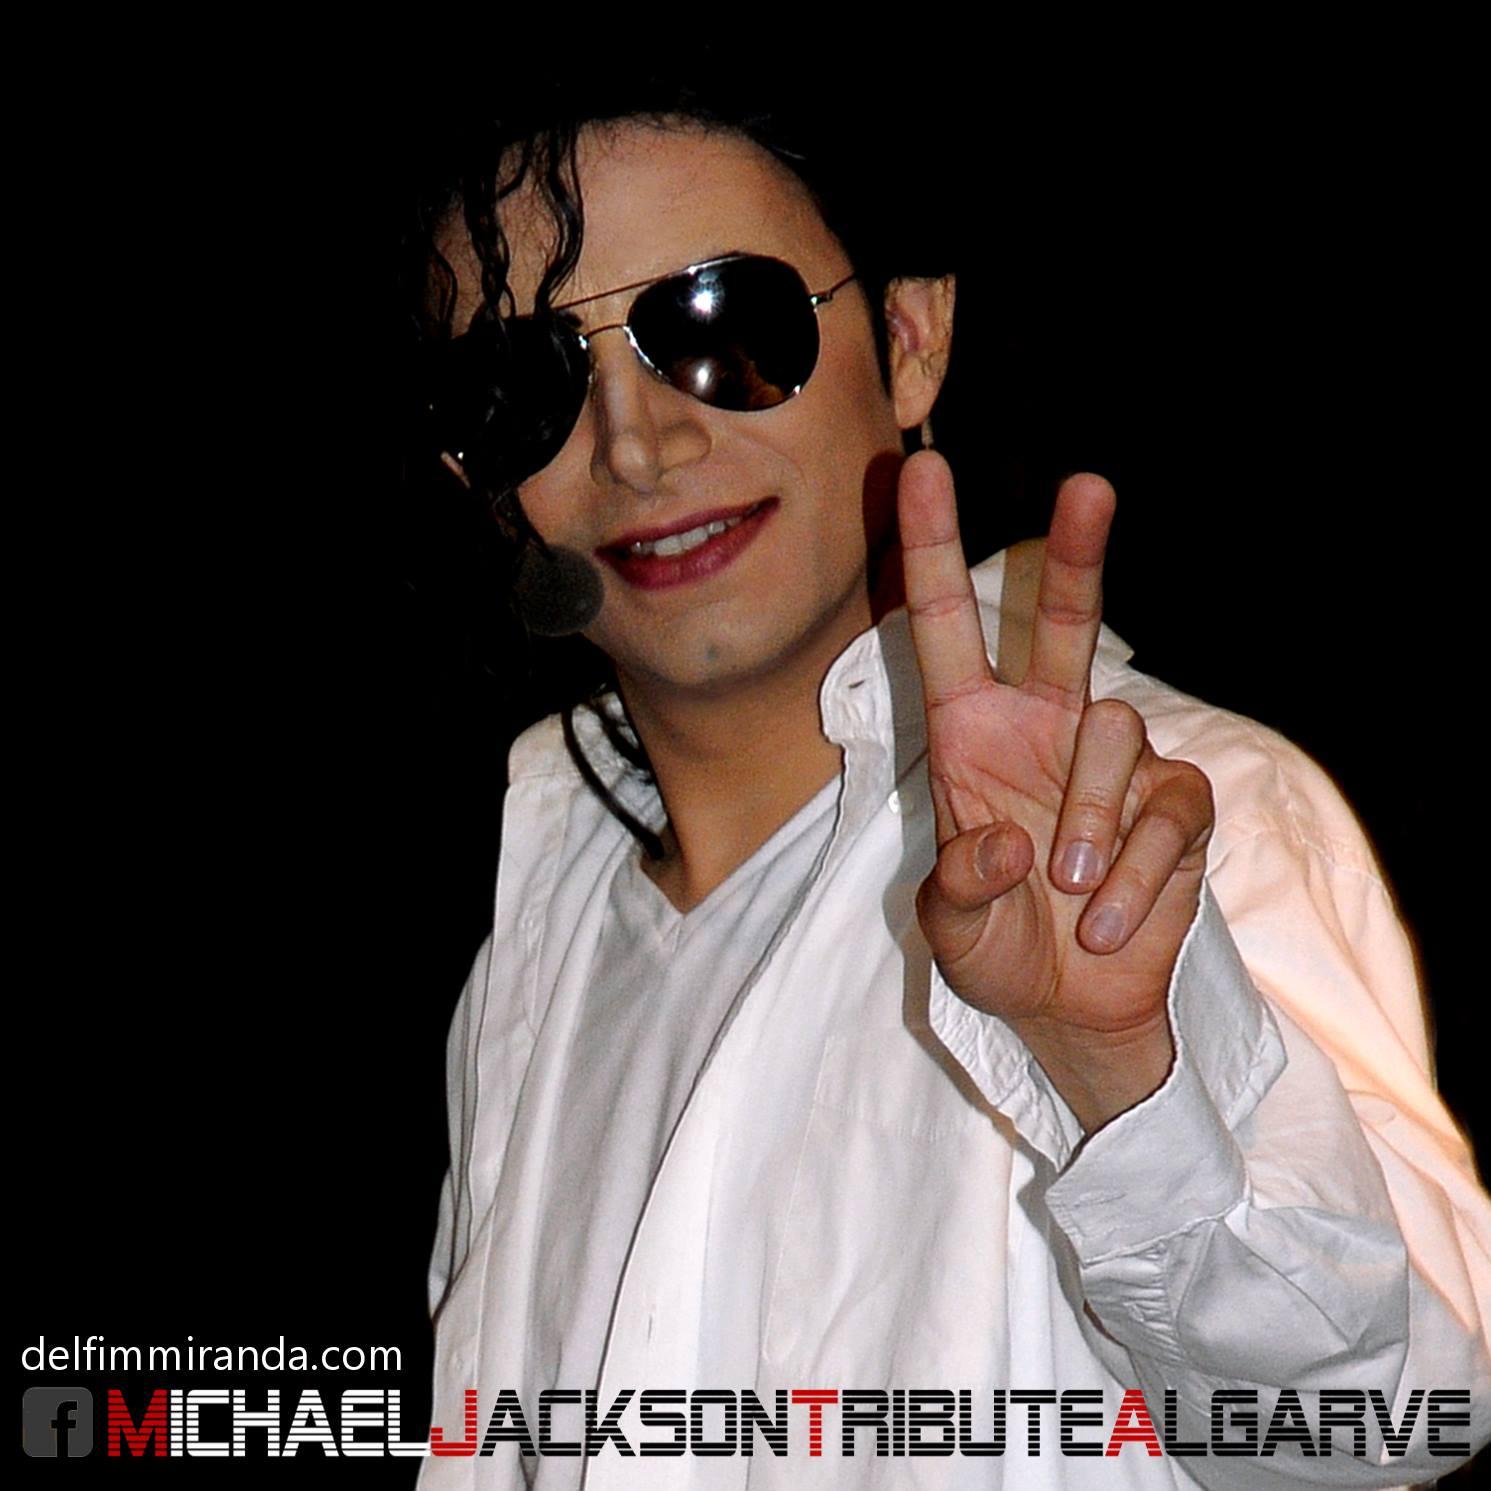 Delfim Miranda as Michael Jackson - Tribute act and impersonator